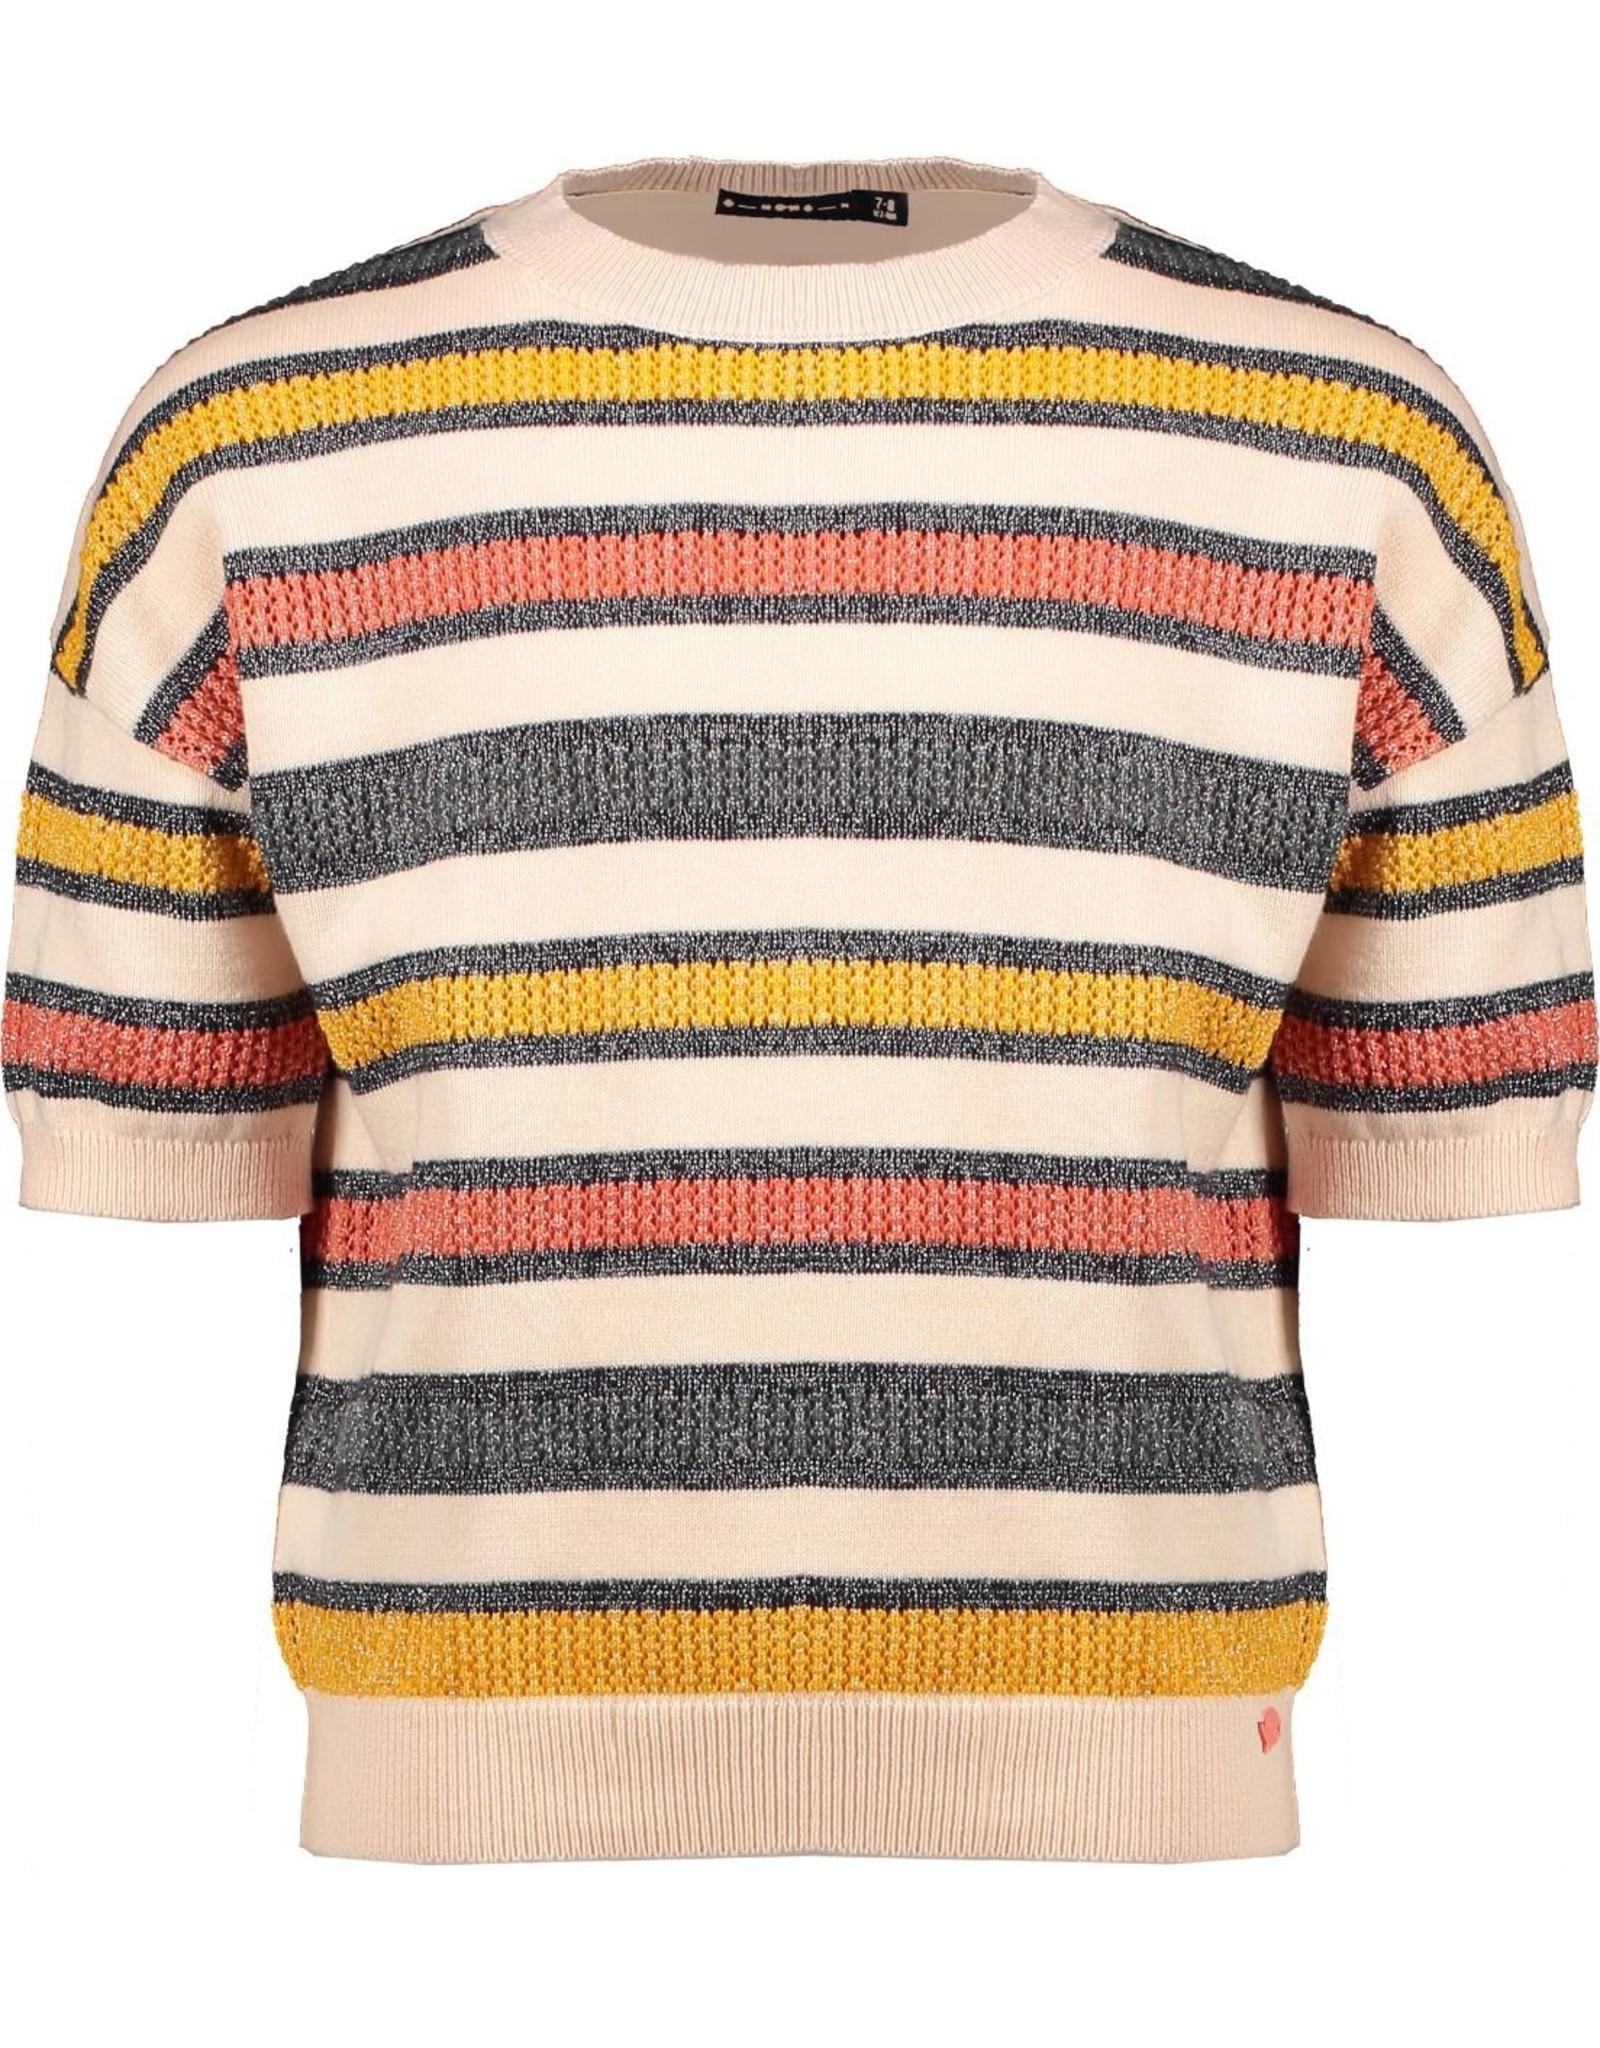 NONO NoNo Kess Knitted Pullover Seashell Pink